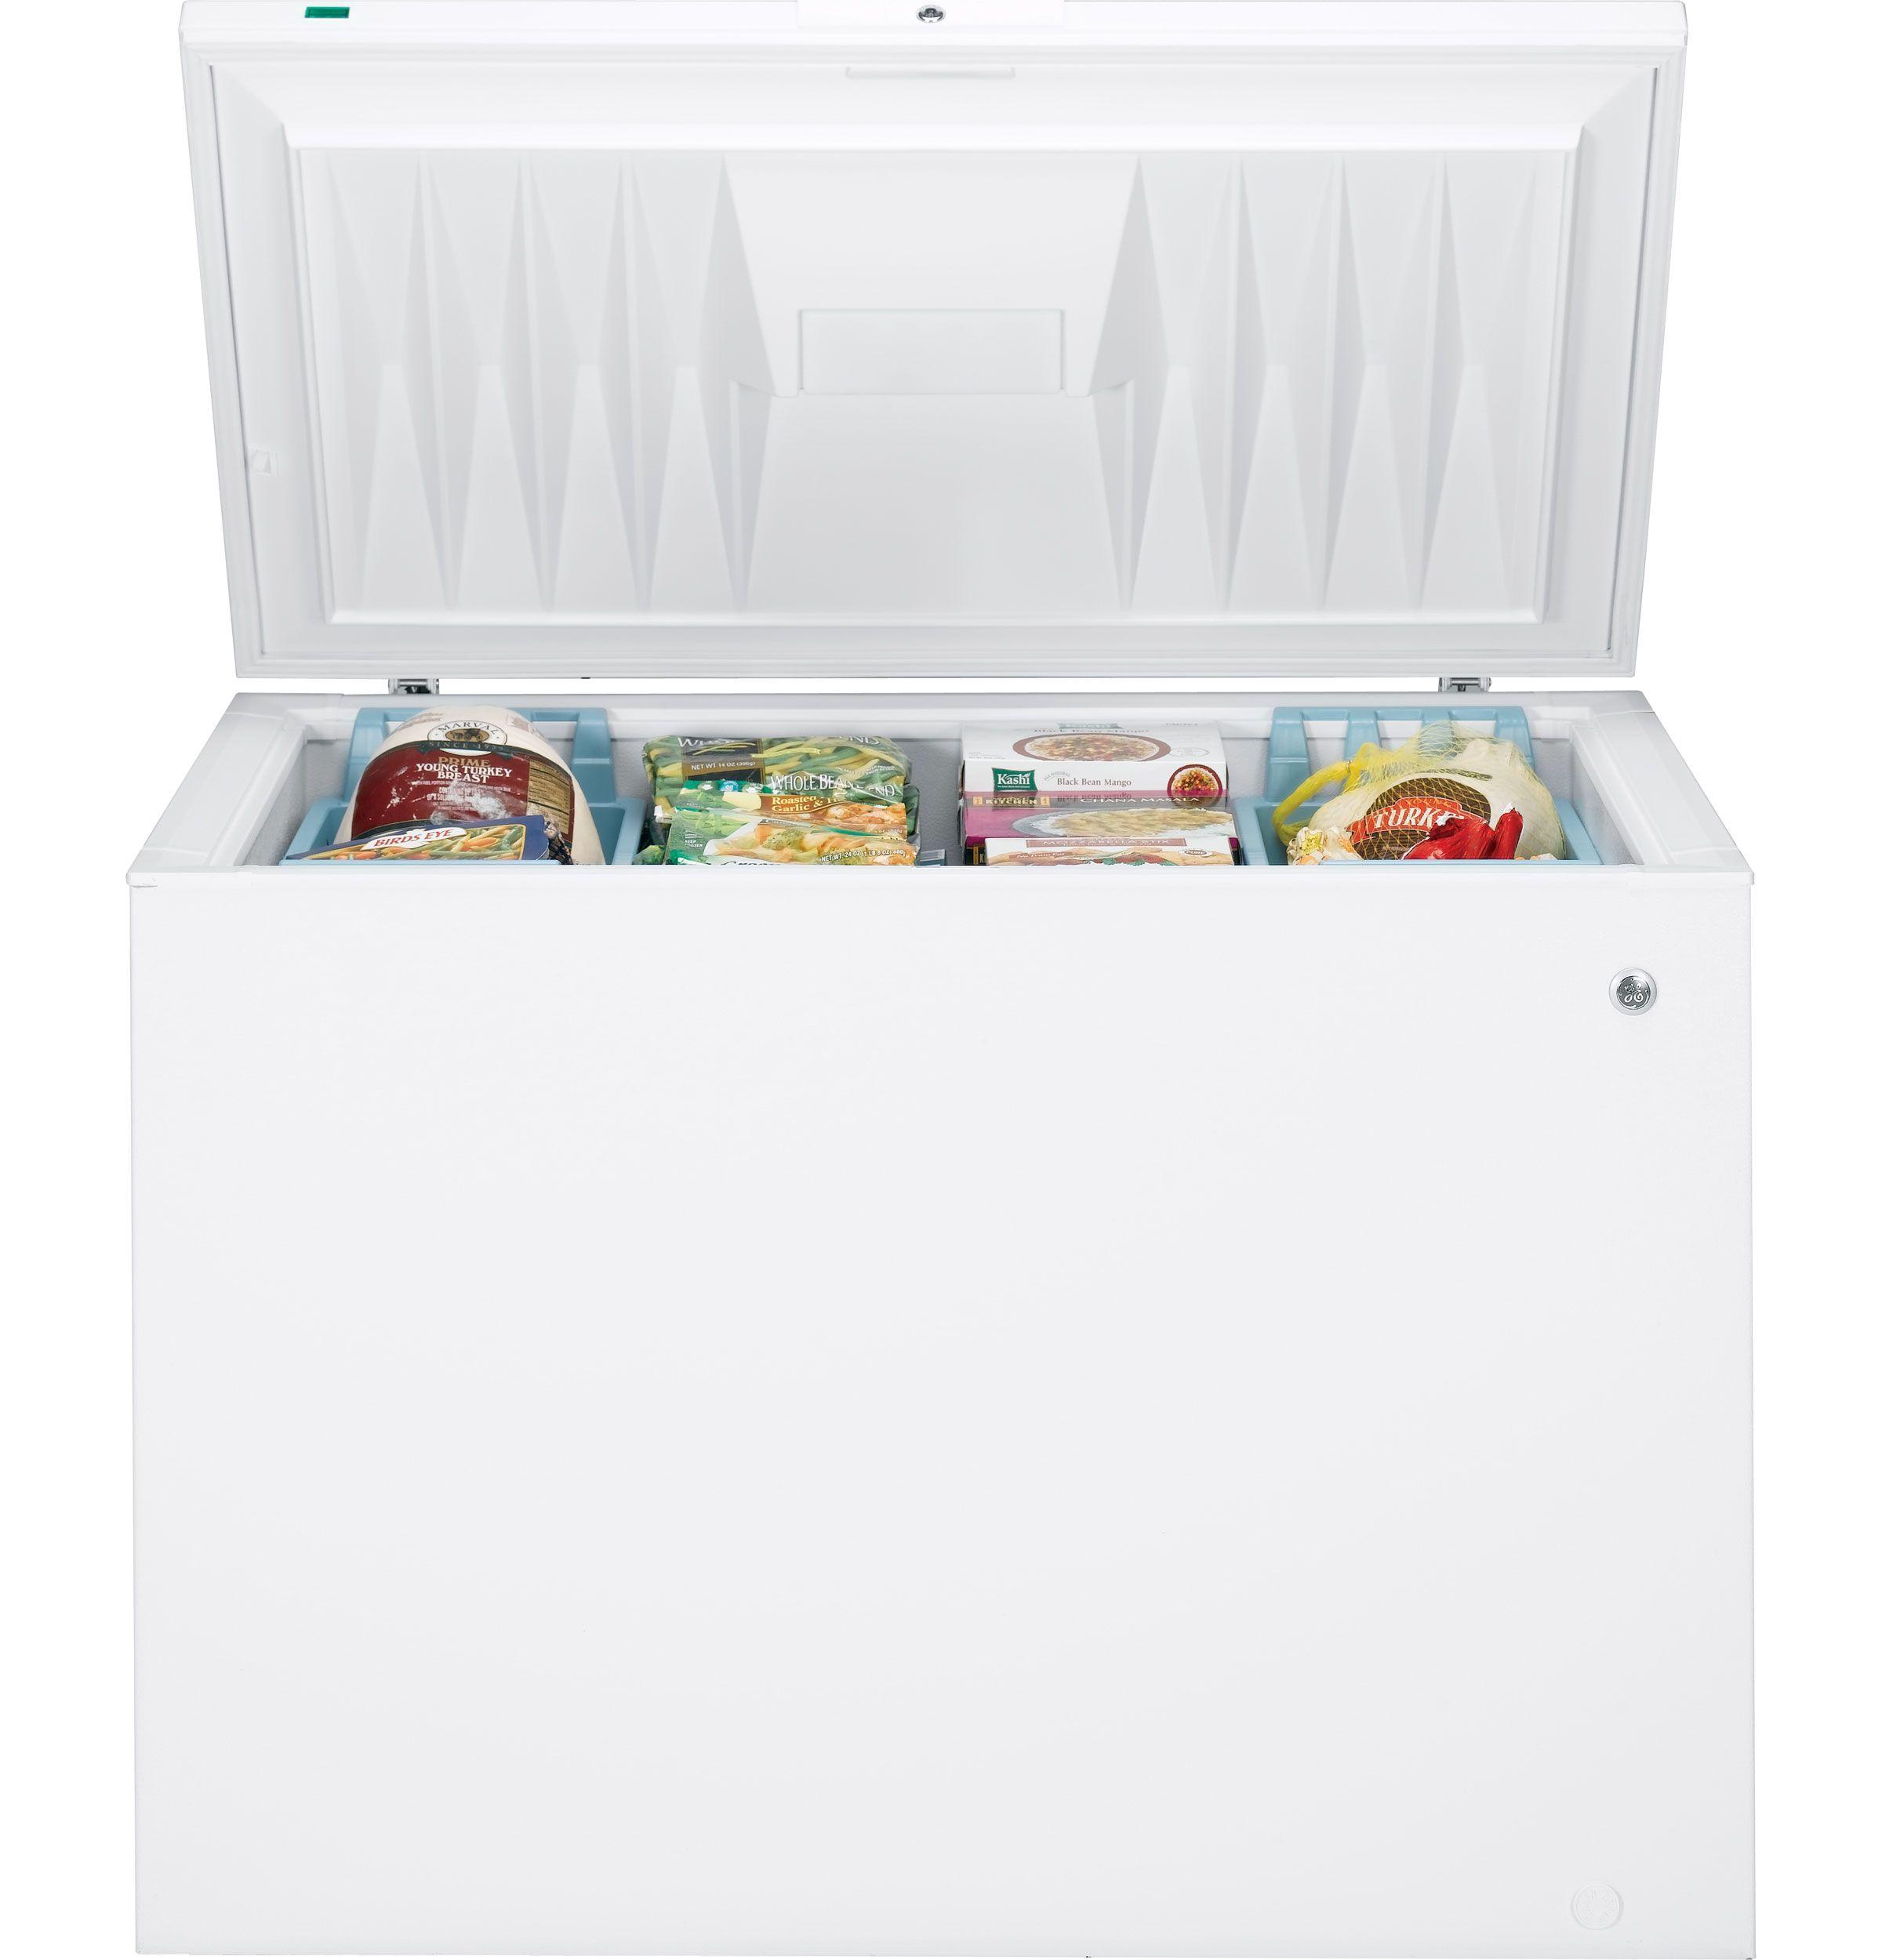 Ge 14 9 Cu Ft Manual Defrost Chest Freezer Fcm15suww Chest Freezer Storage White Chests